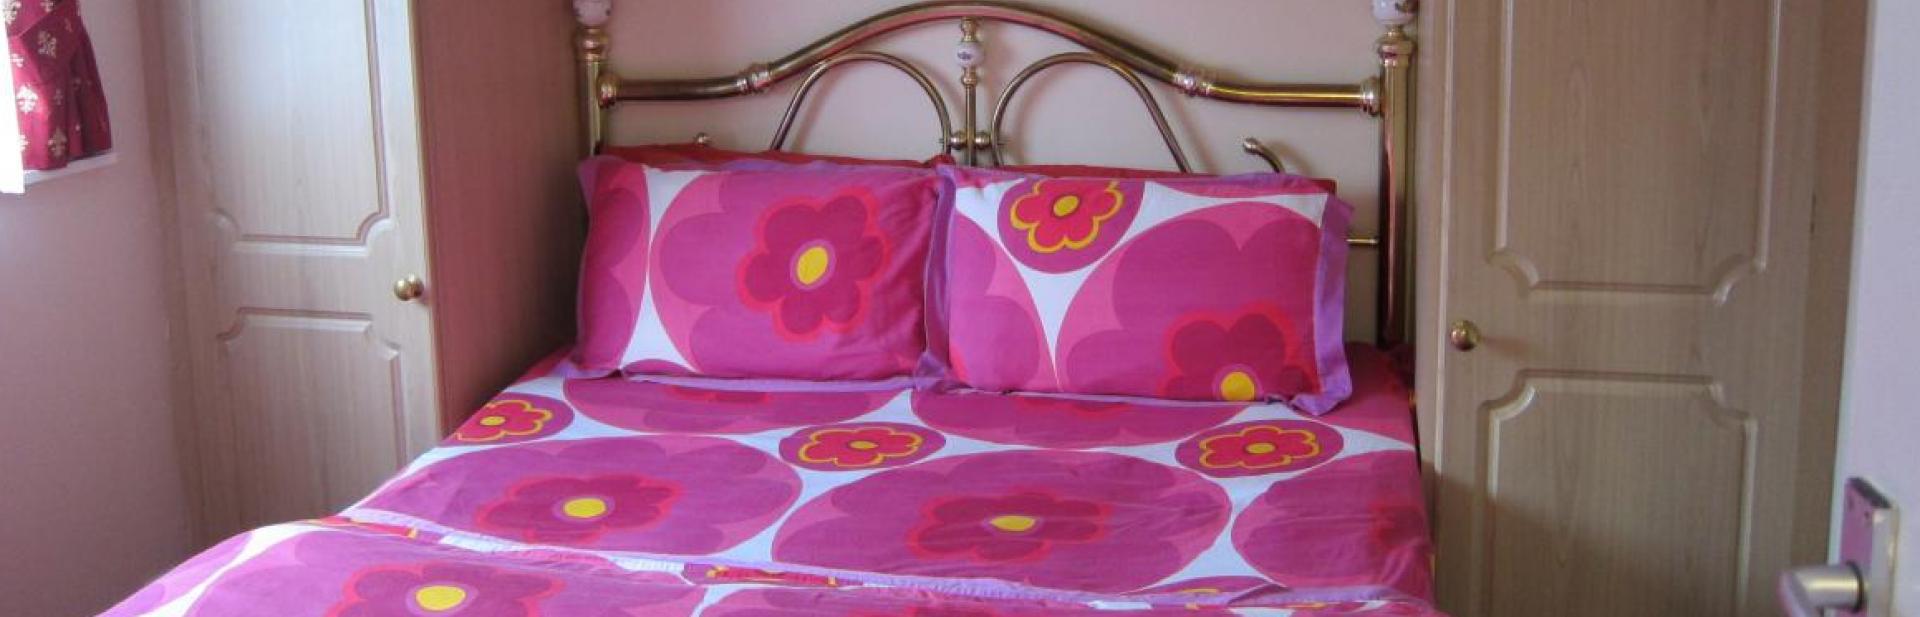 30471.pink room.PNG